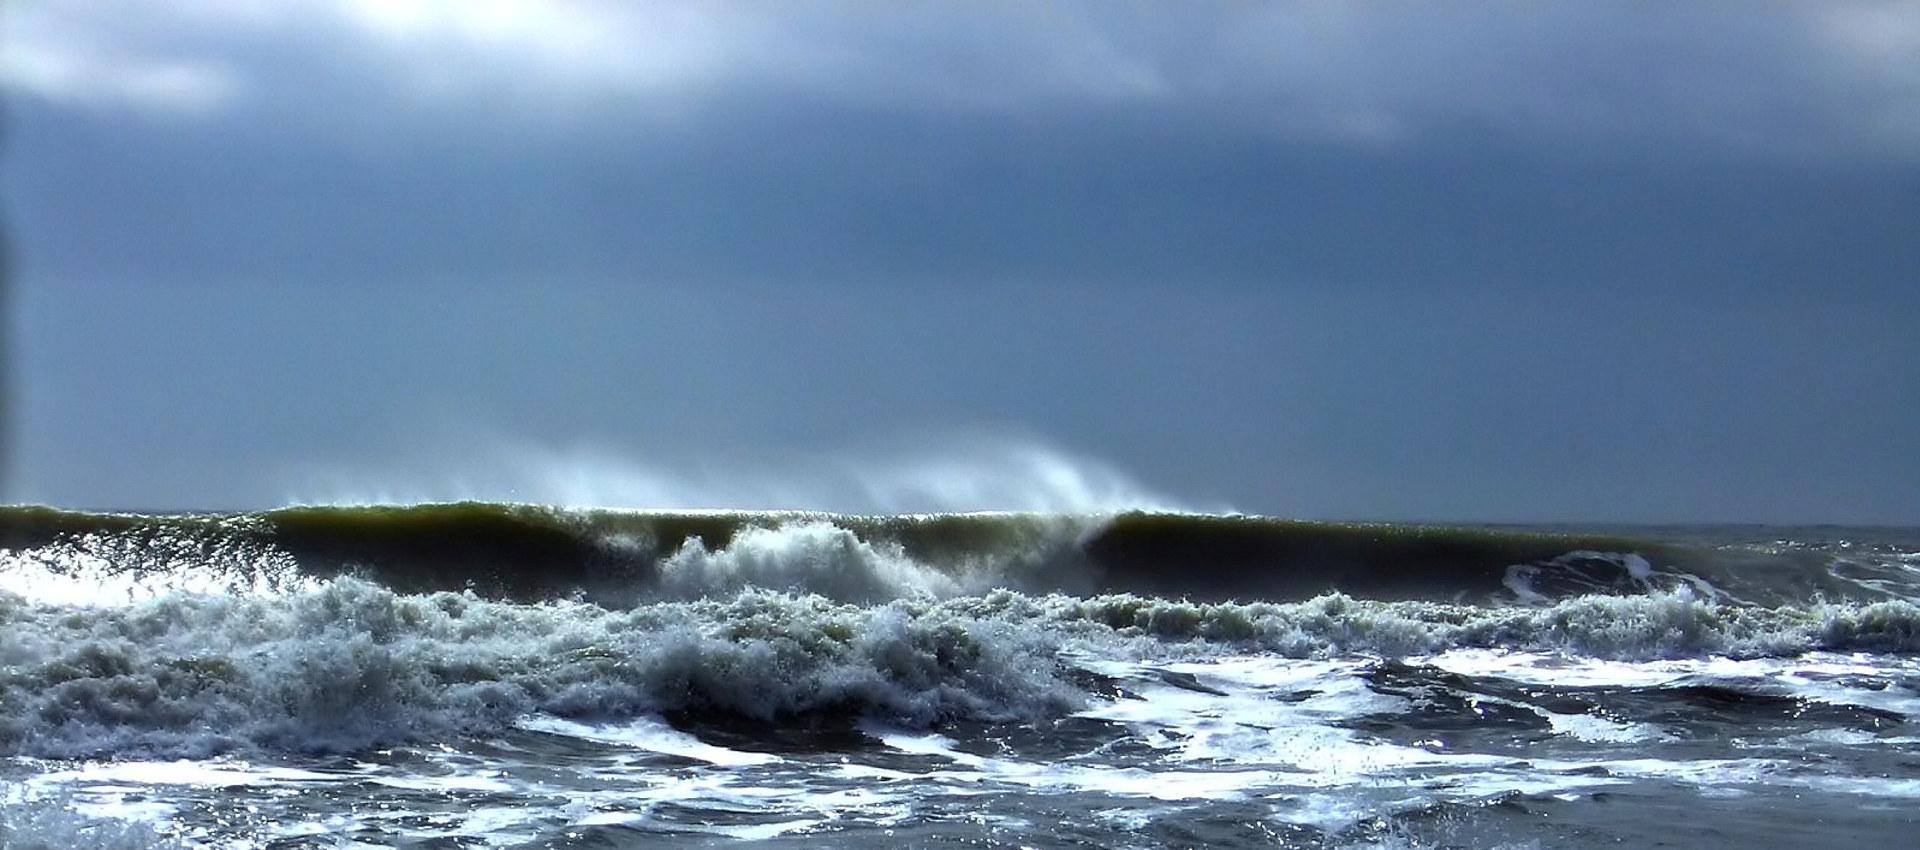 Bølger i havet